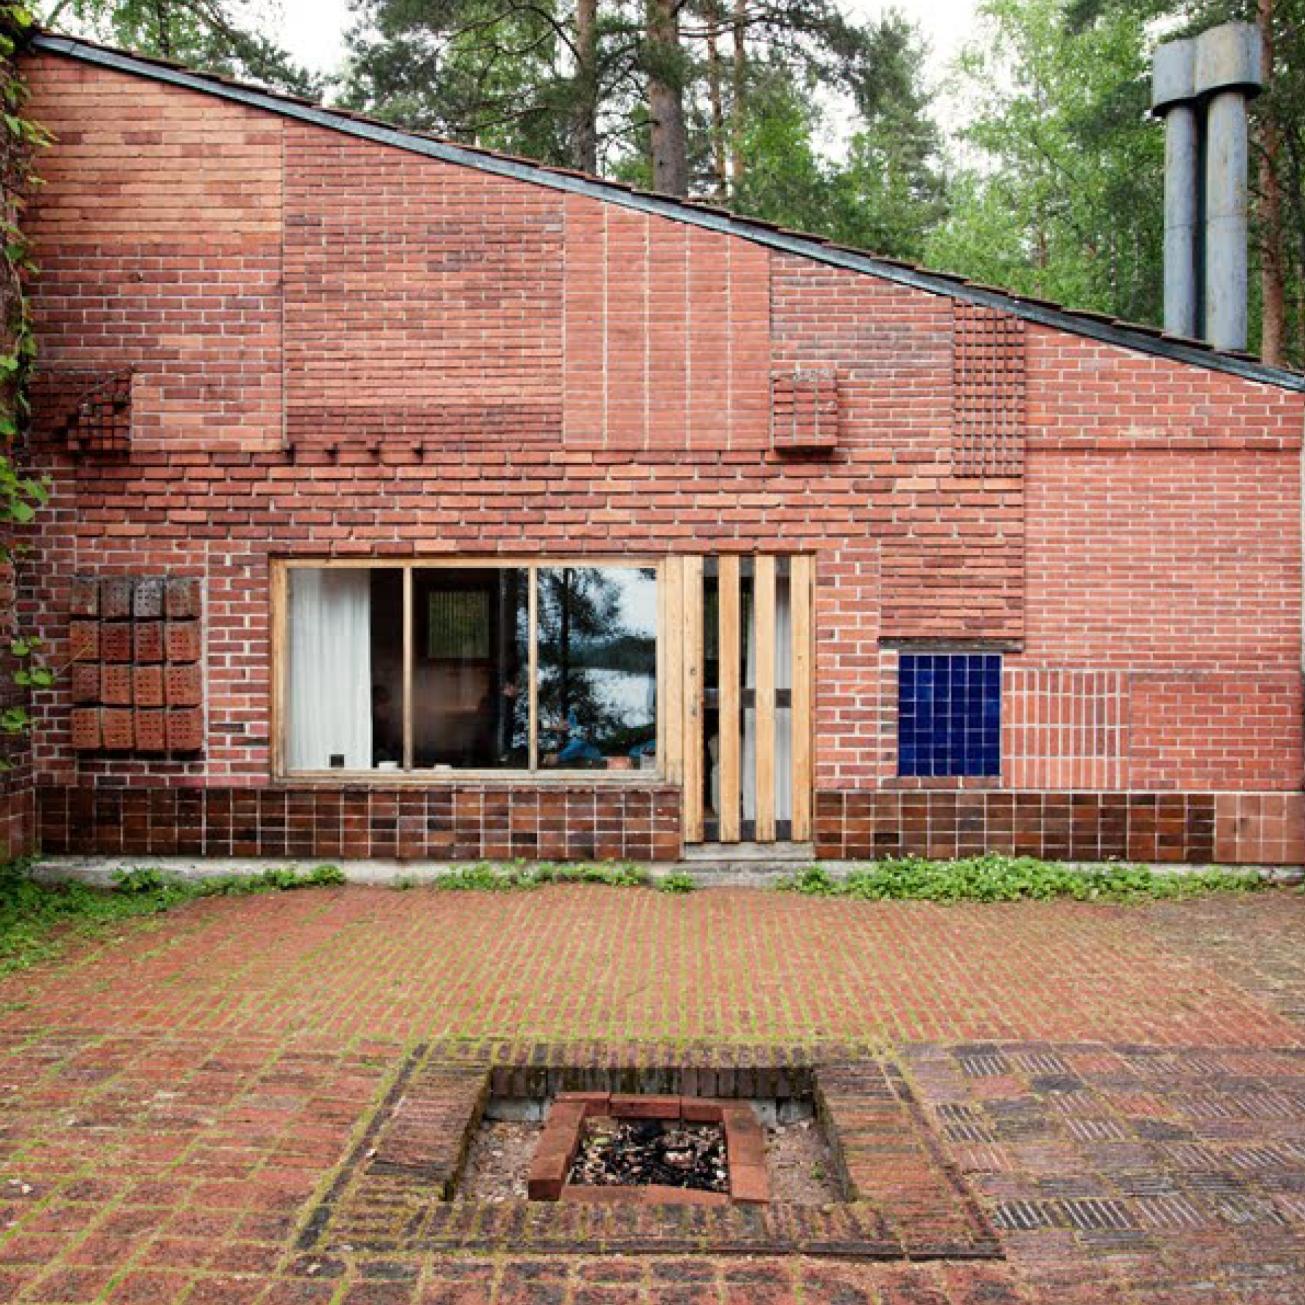 AthomeAlvar Aalto- The ExperimentalHouse